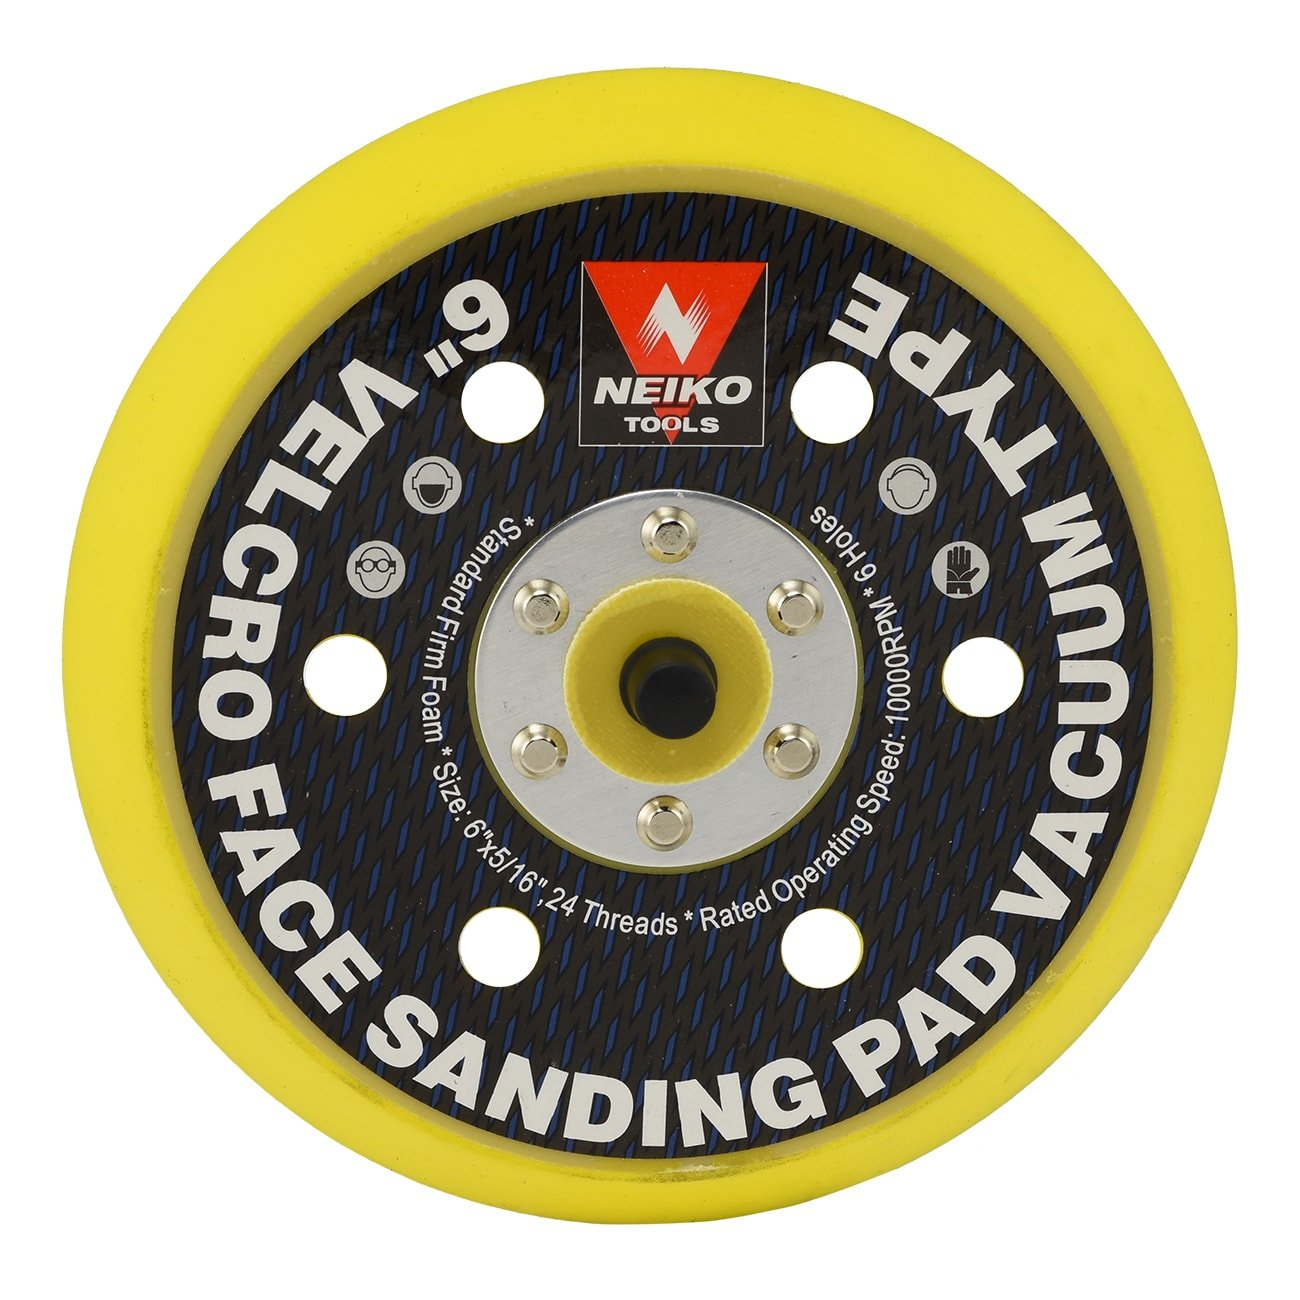 Neiko 30265A Velcro Face Sanding Pad 6-inch Multi-hole Vacuum Type for Dual Action Orbital Air Sander Ridgerock Tools Inc.